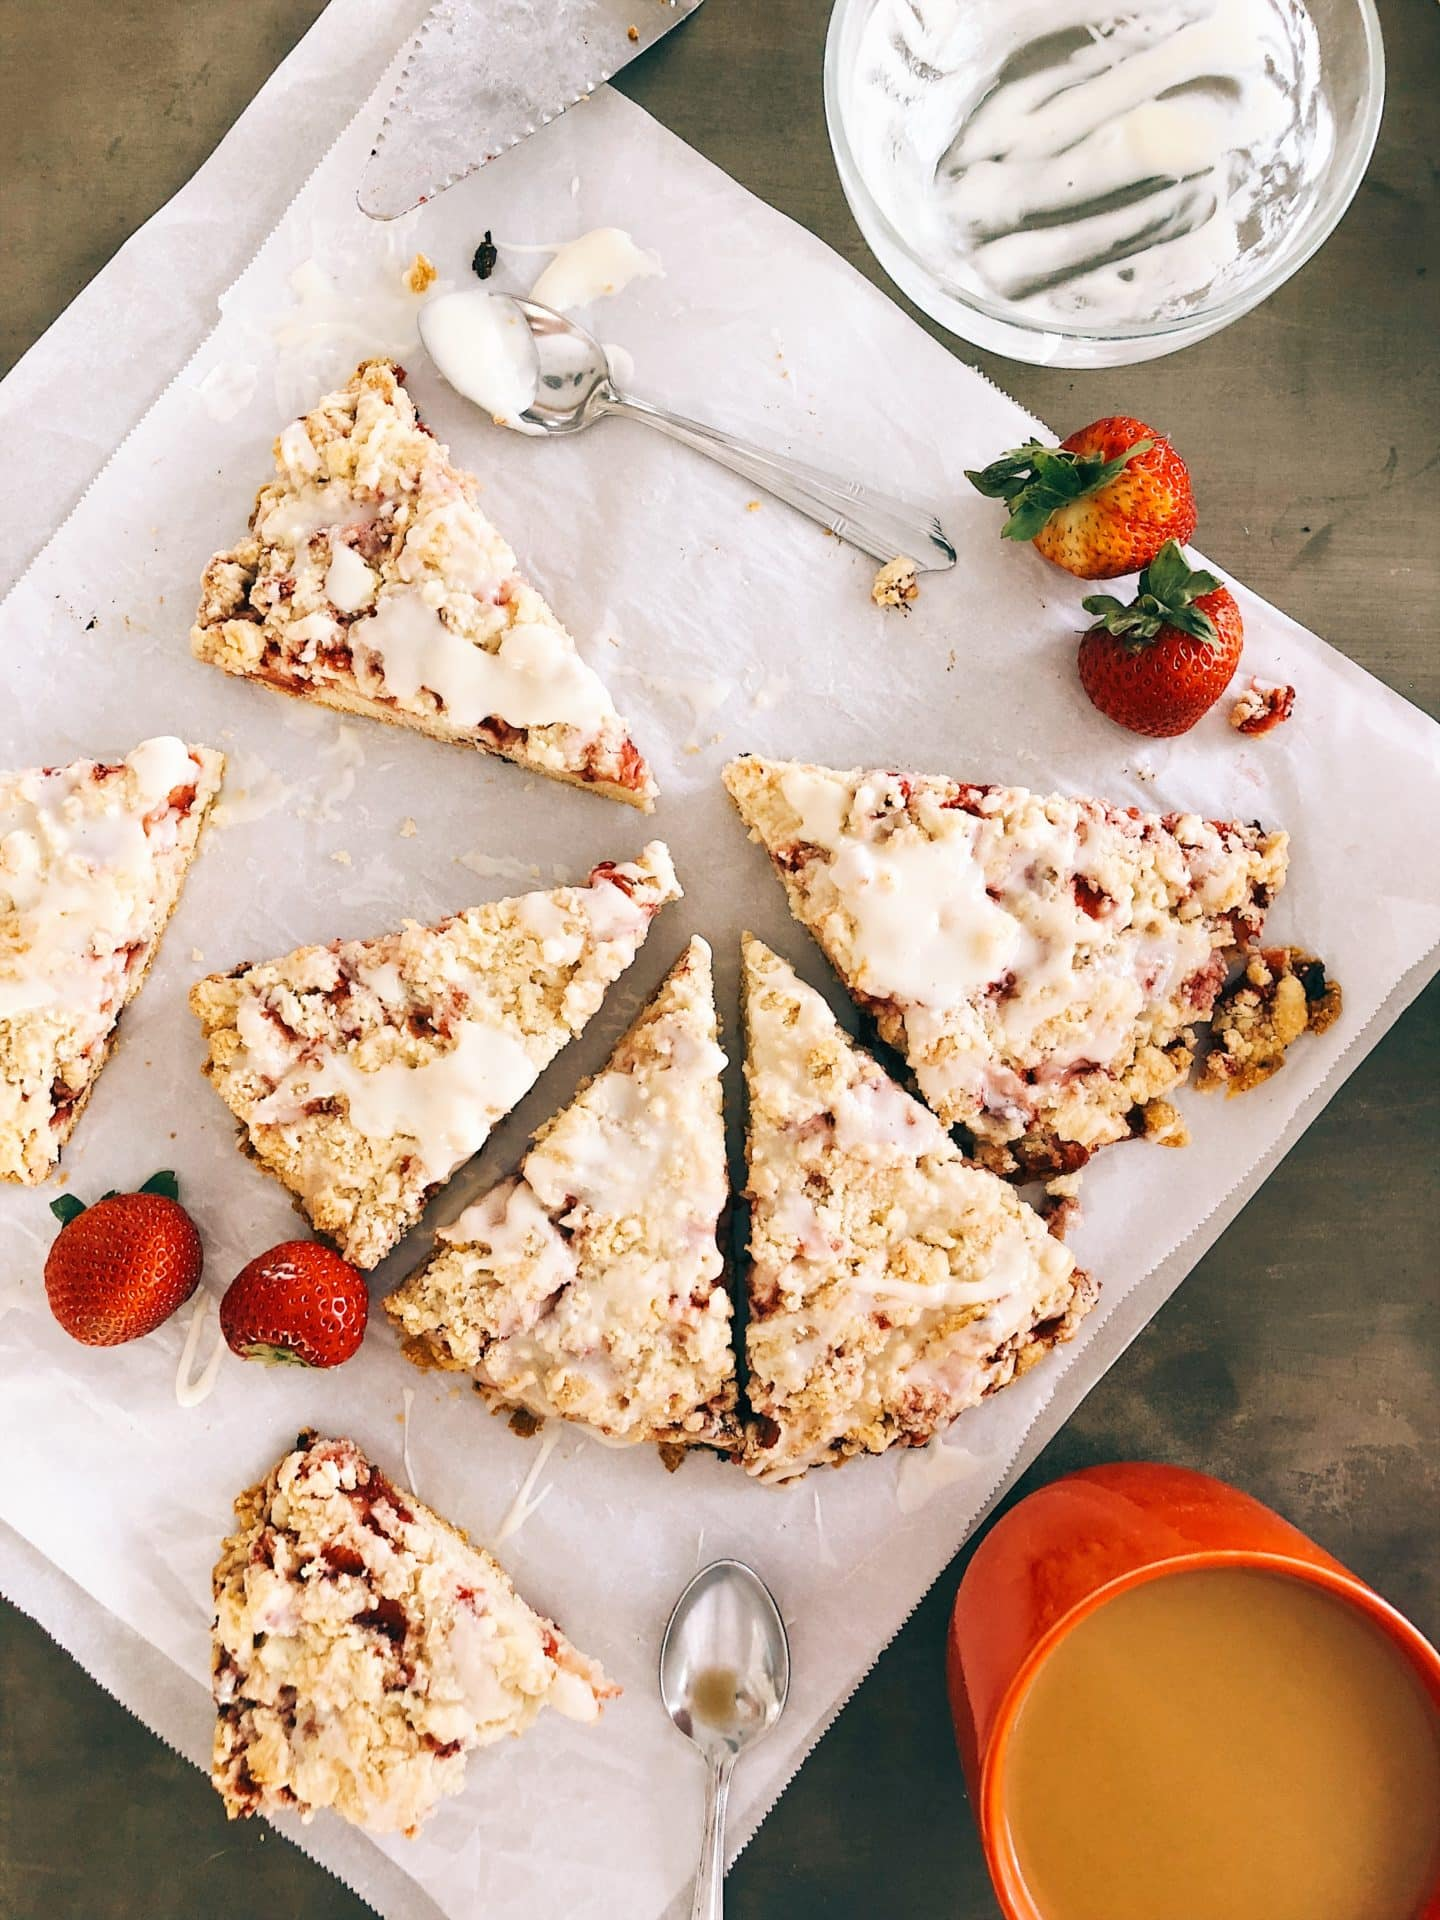 Strawberries and Cream Scone recipe